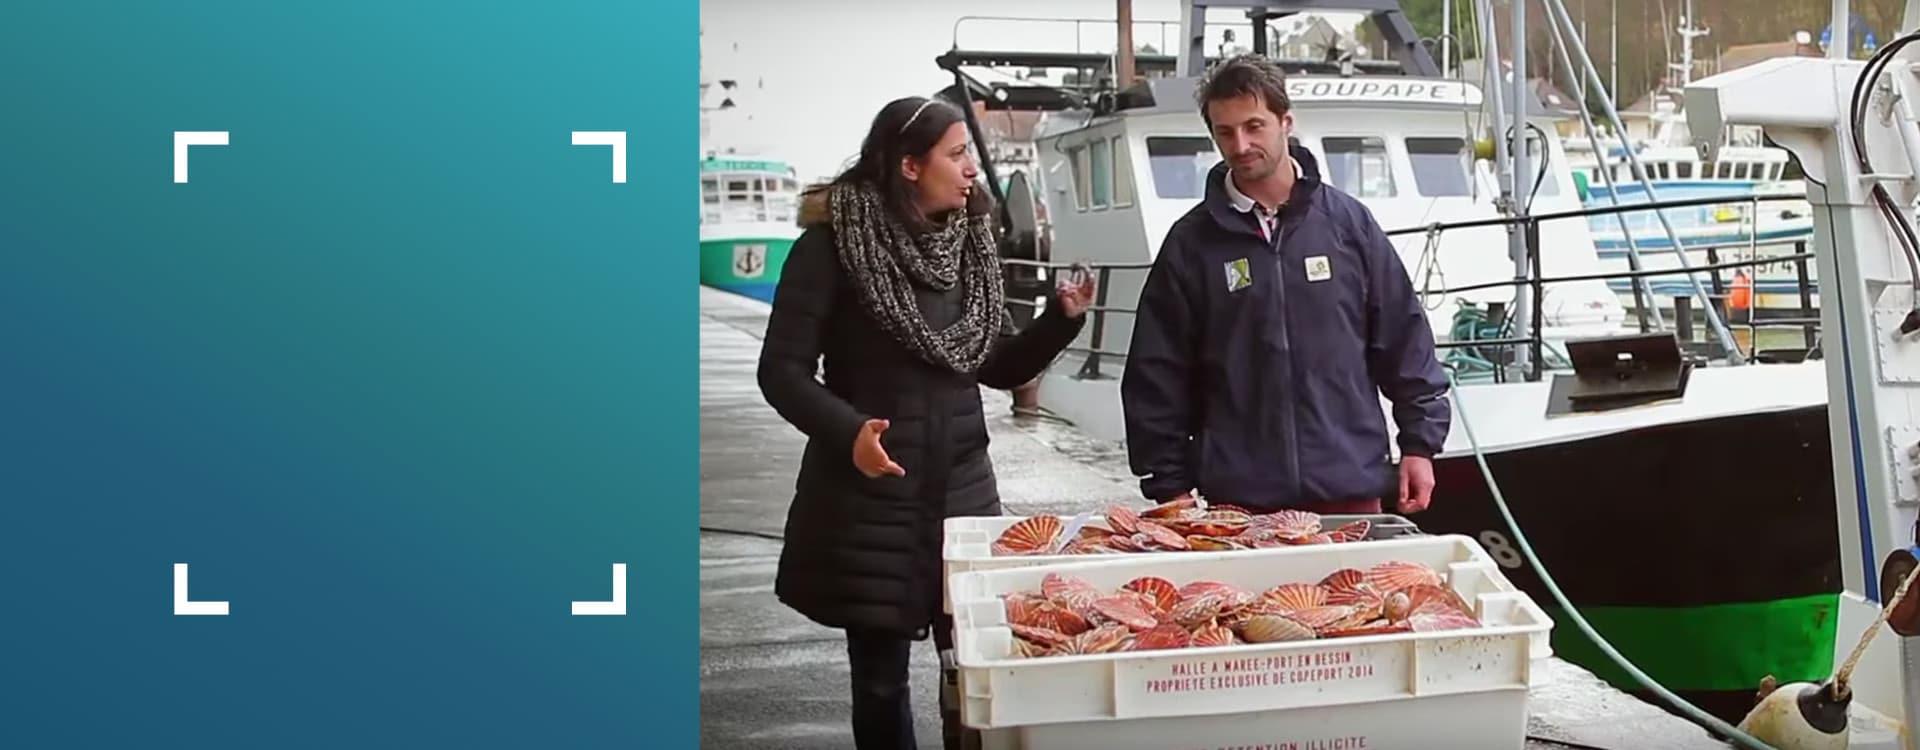 Comptoir de la mer - vidéo Quentin Yonnet